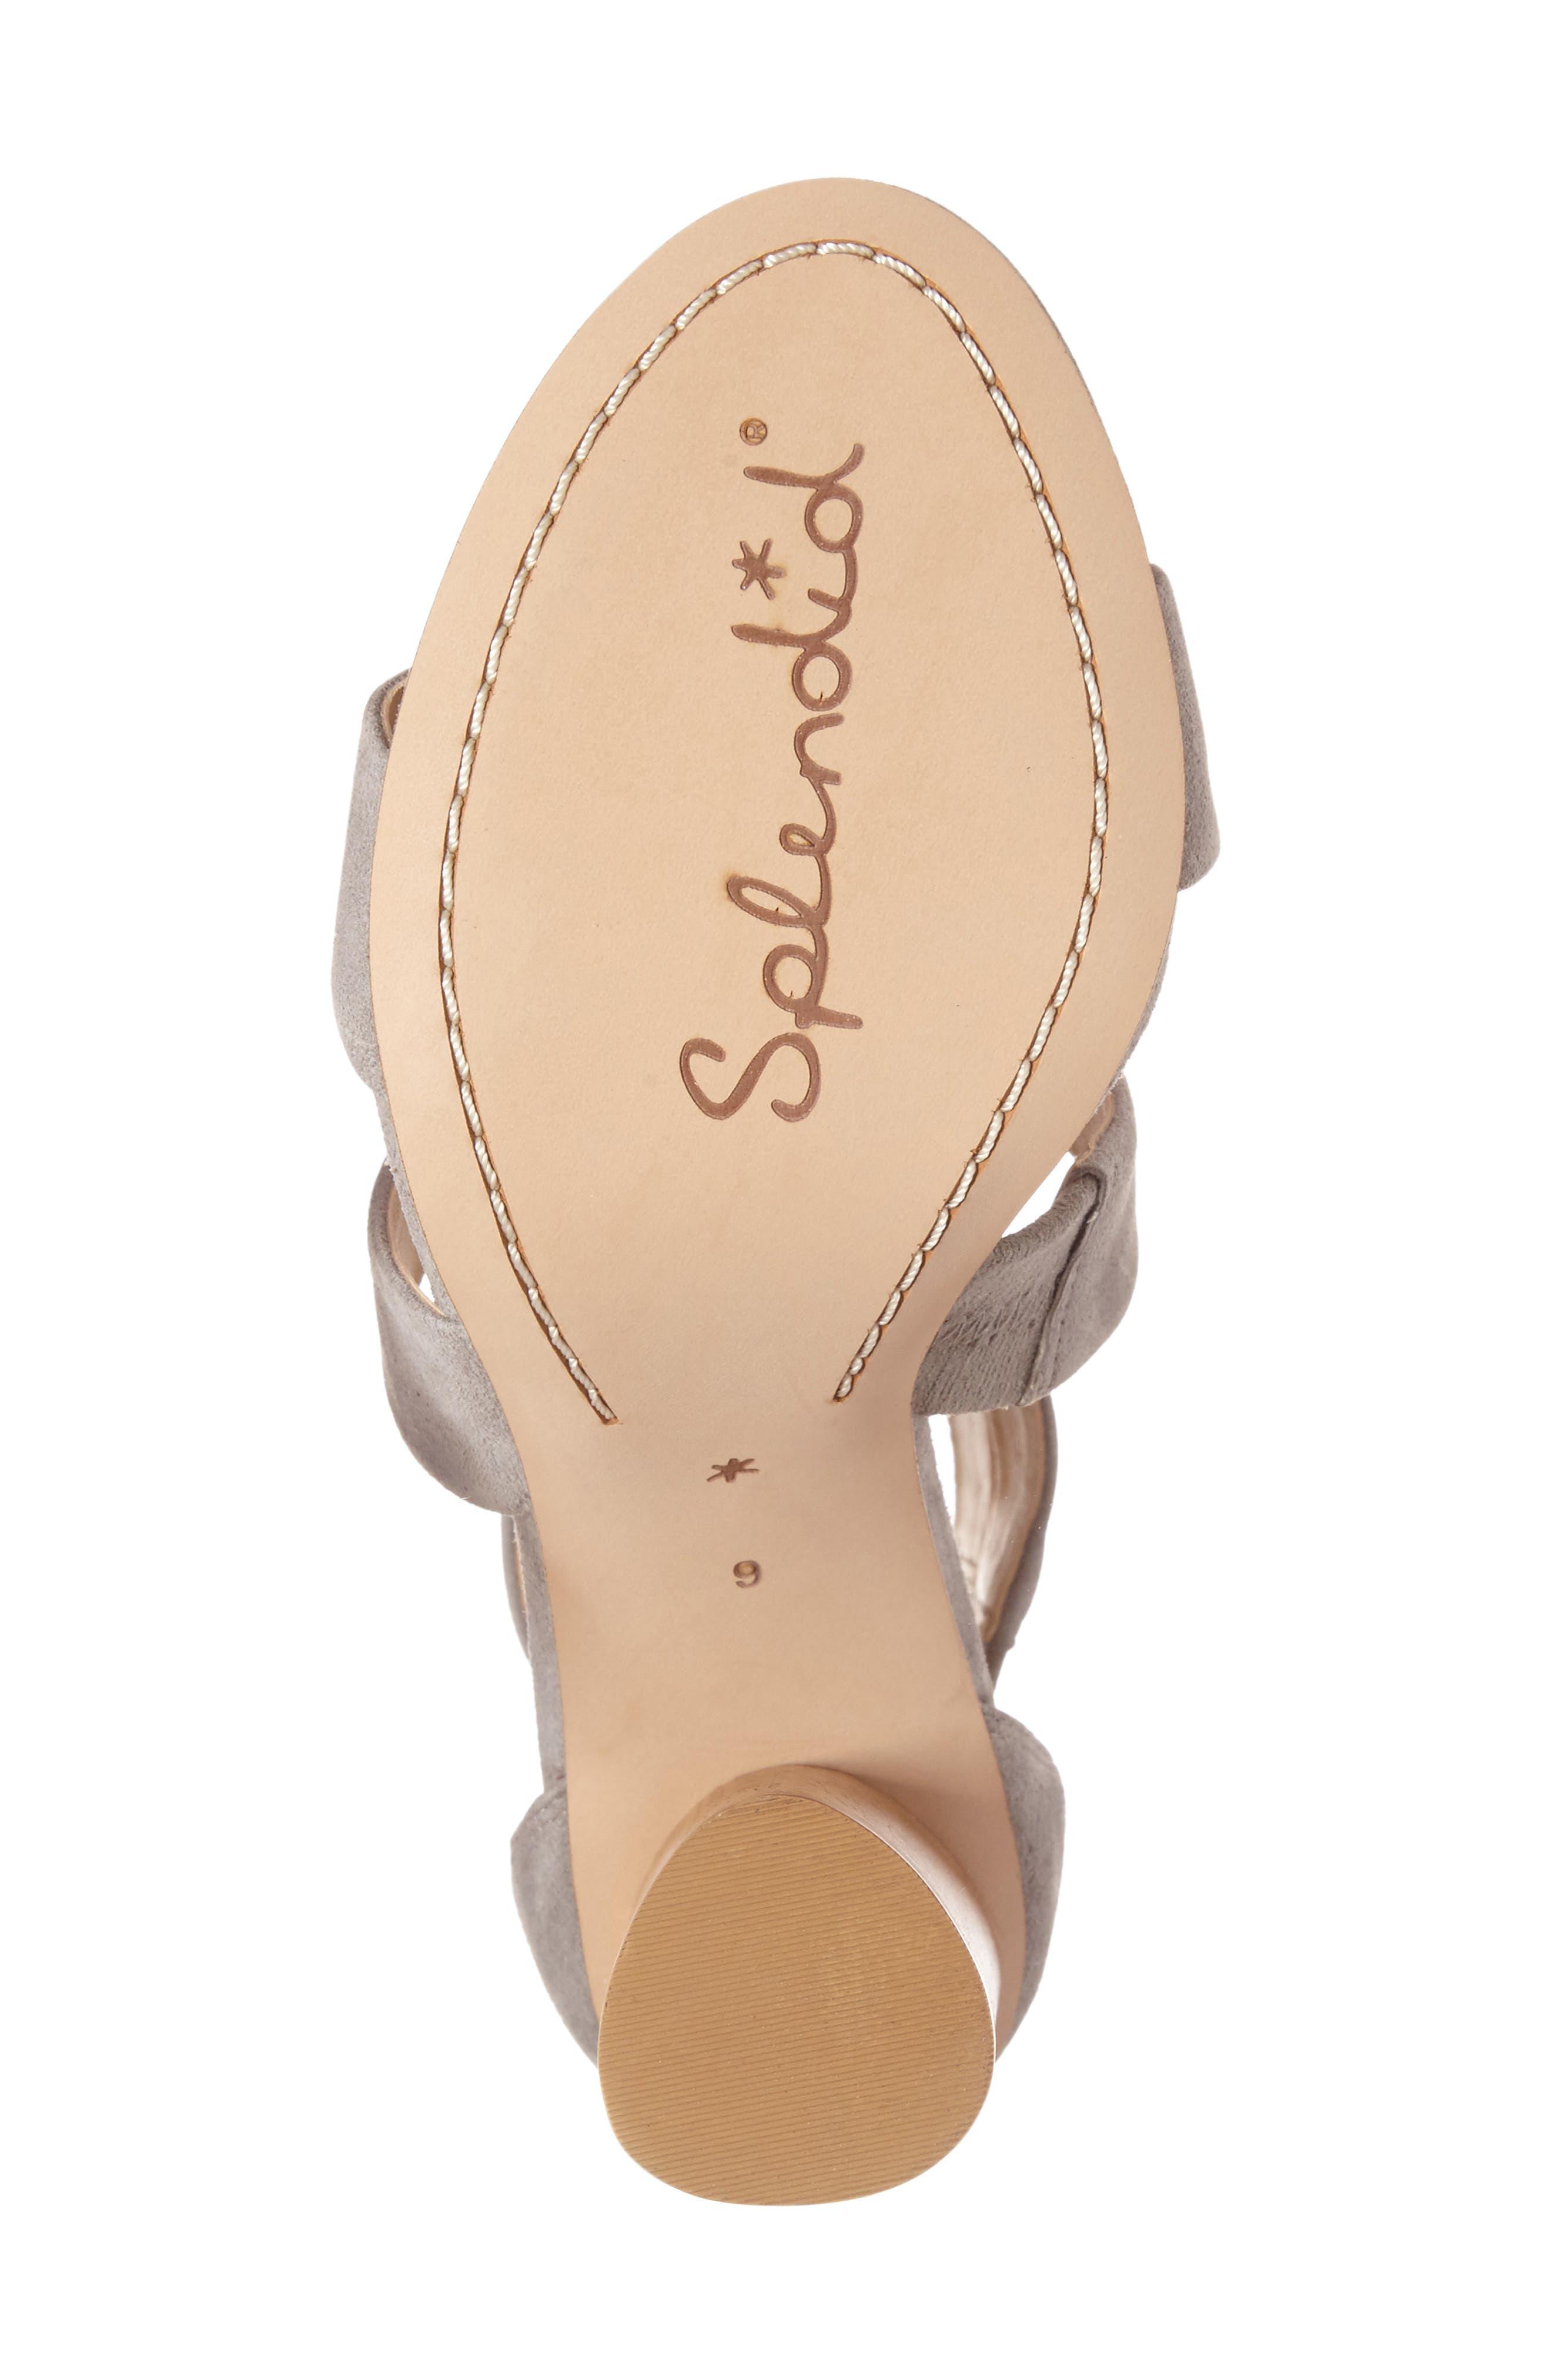 Jara Statement Heel Sandal,                             Alternate thumbnail 4, color,                             Light Grey Suede